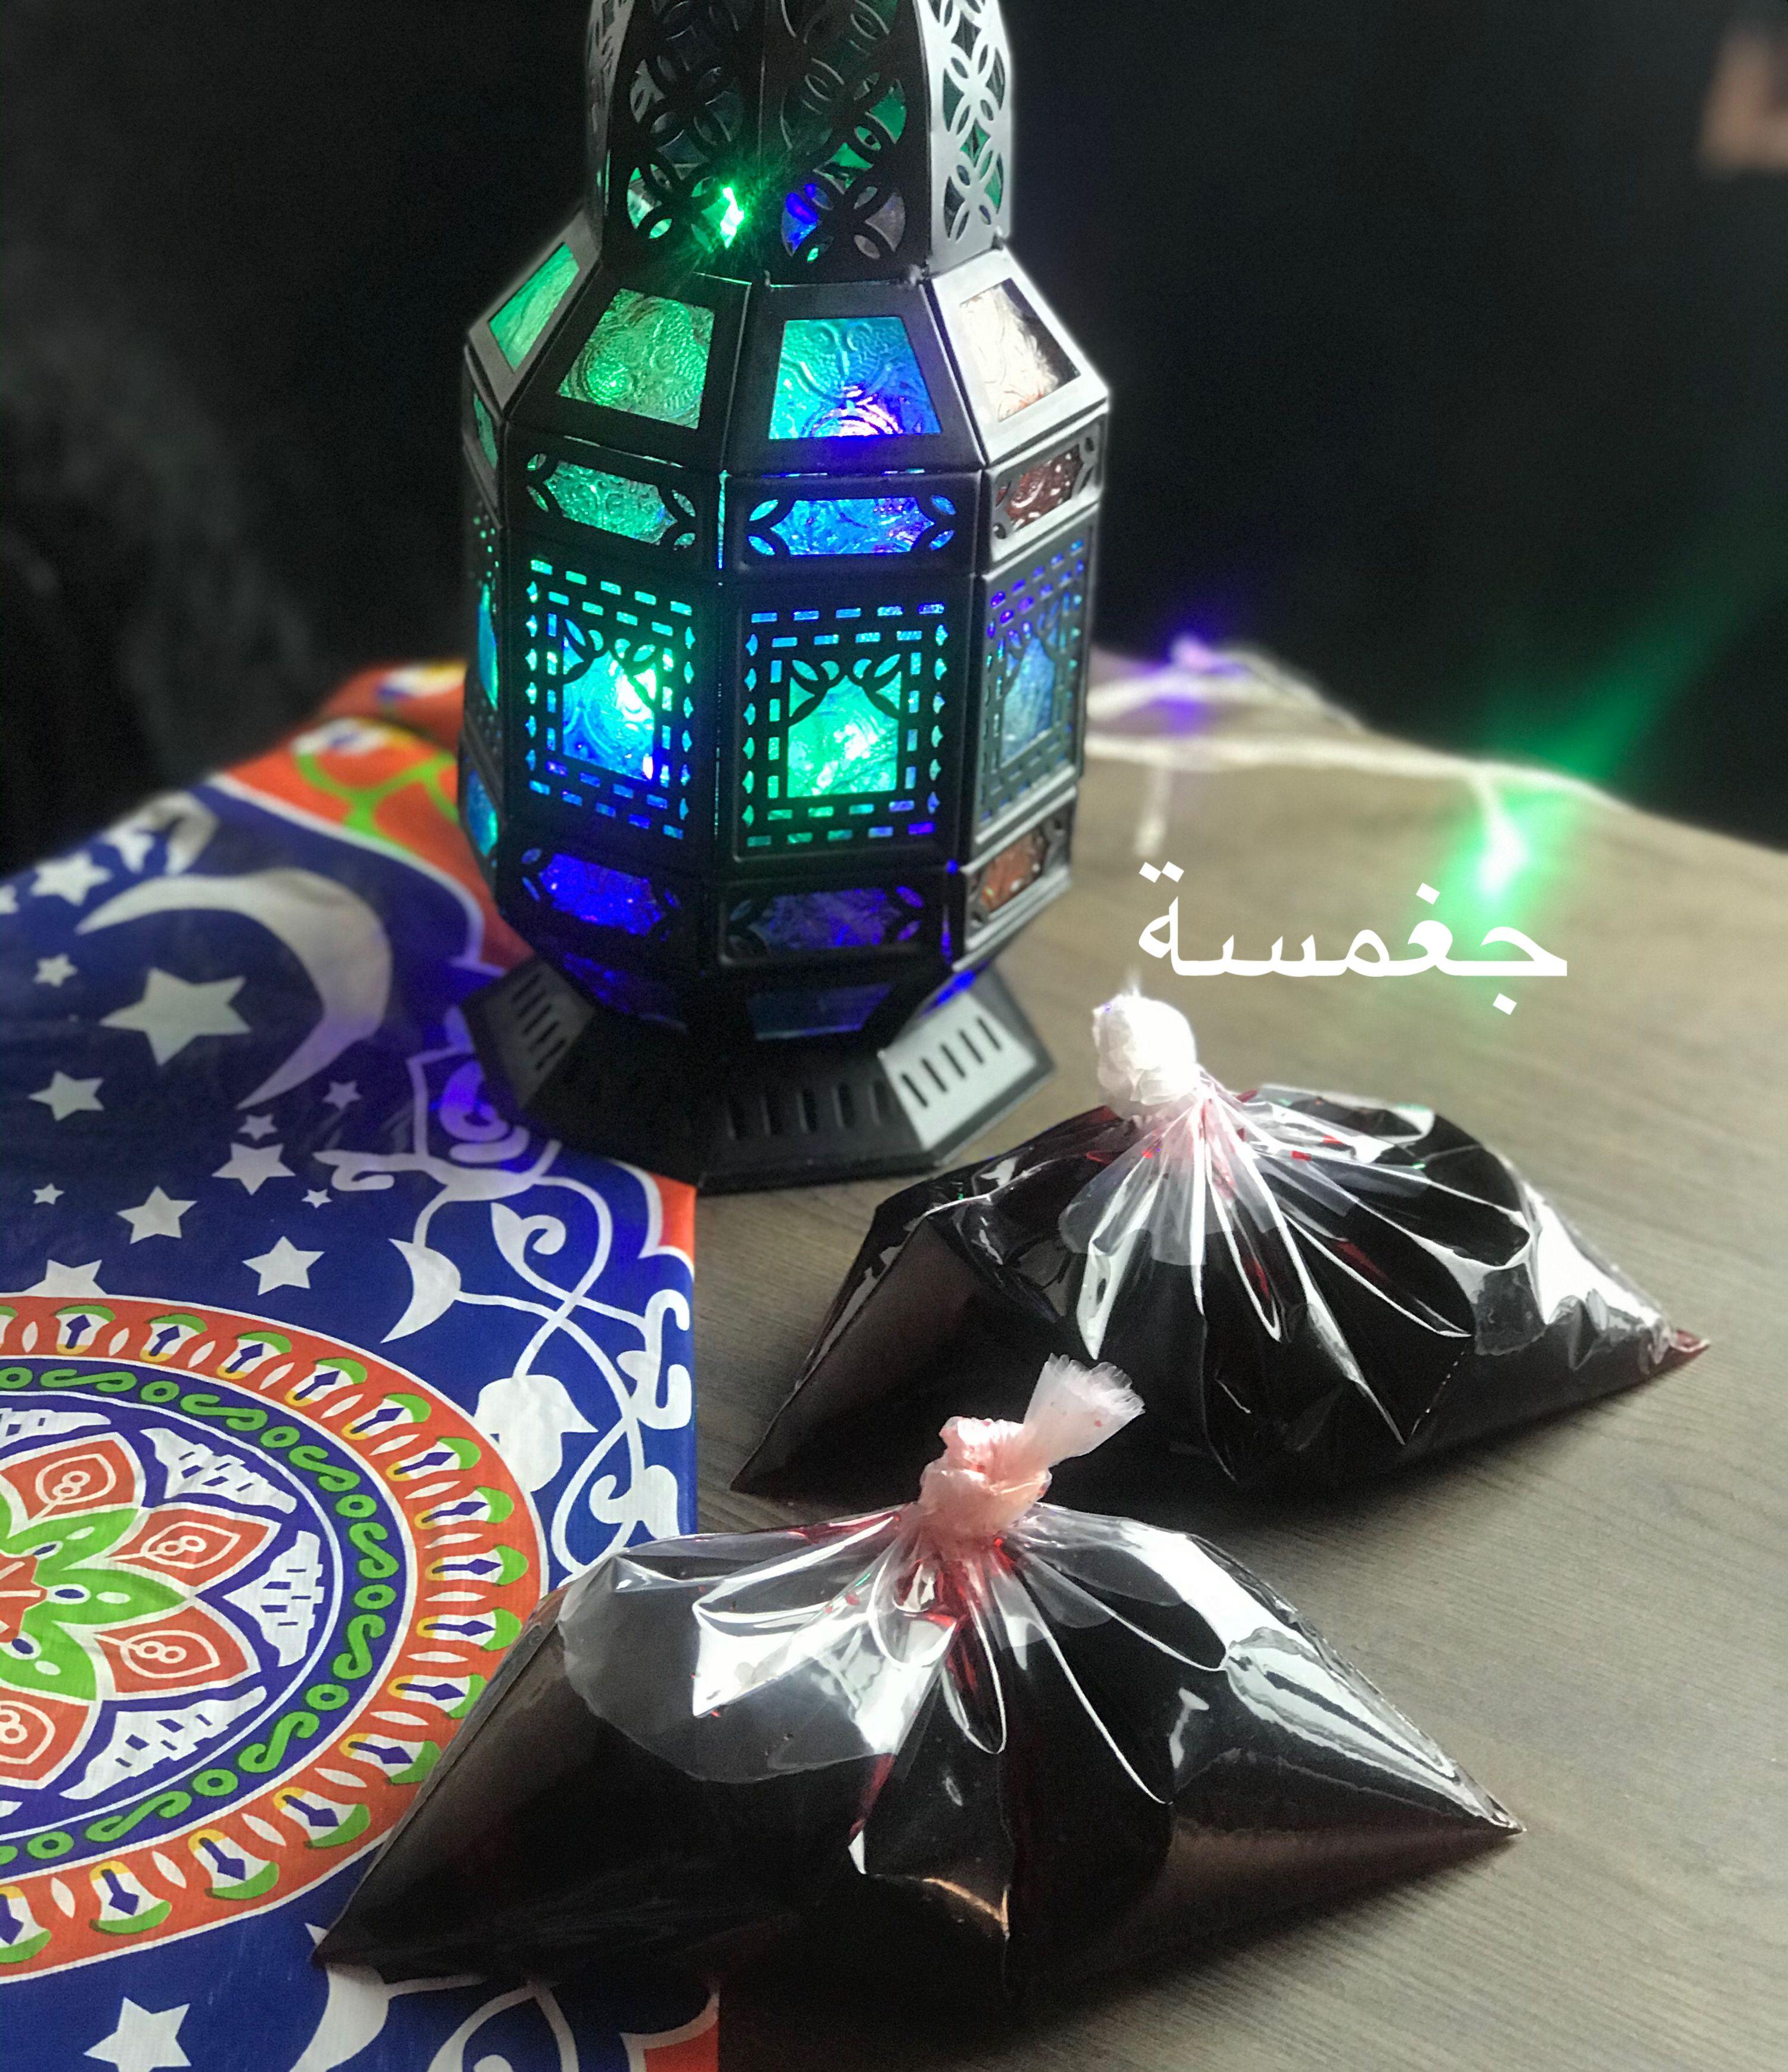 Pin By Ran On رمضان 2022 Christmas Bulbs Christmas Ornaments Holiday Decor